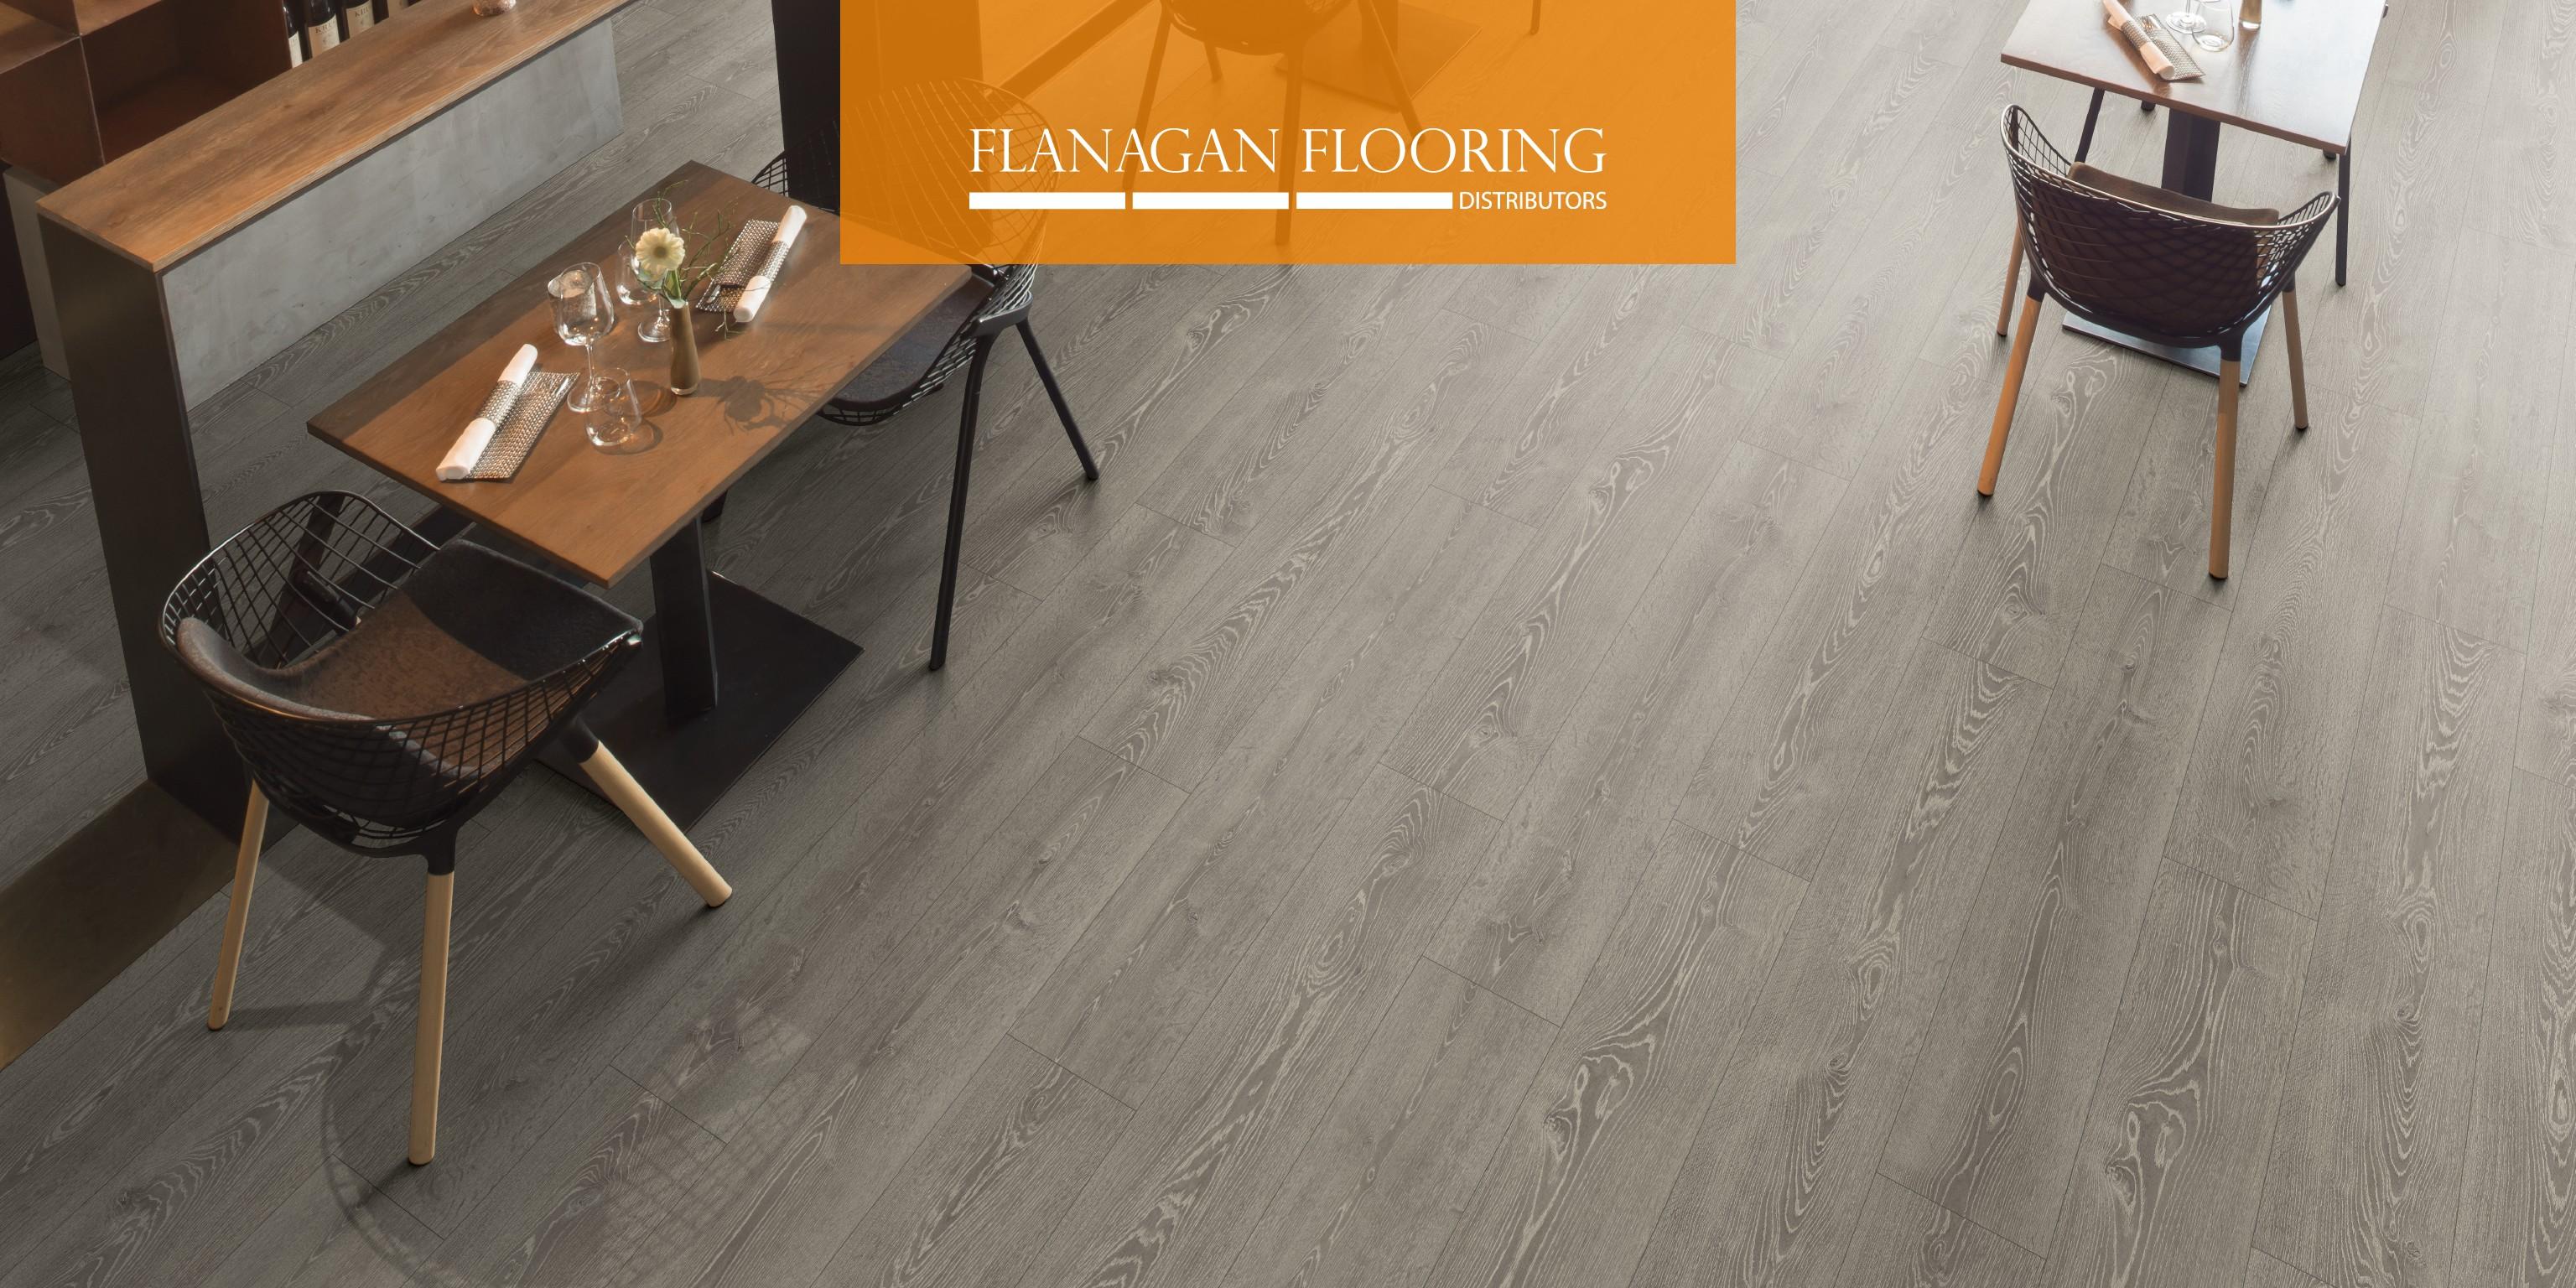 Flanagan Flooring Distributors Scotland Limited Cover Image